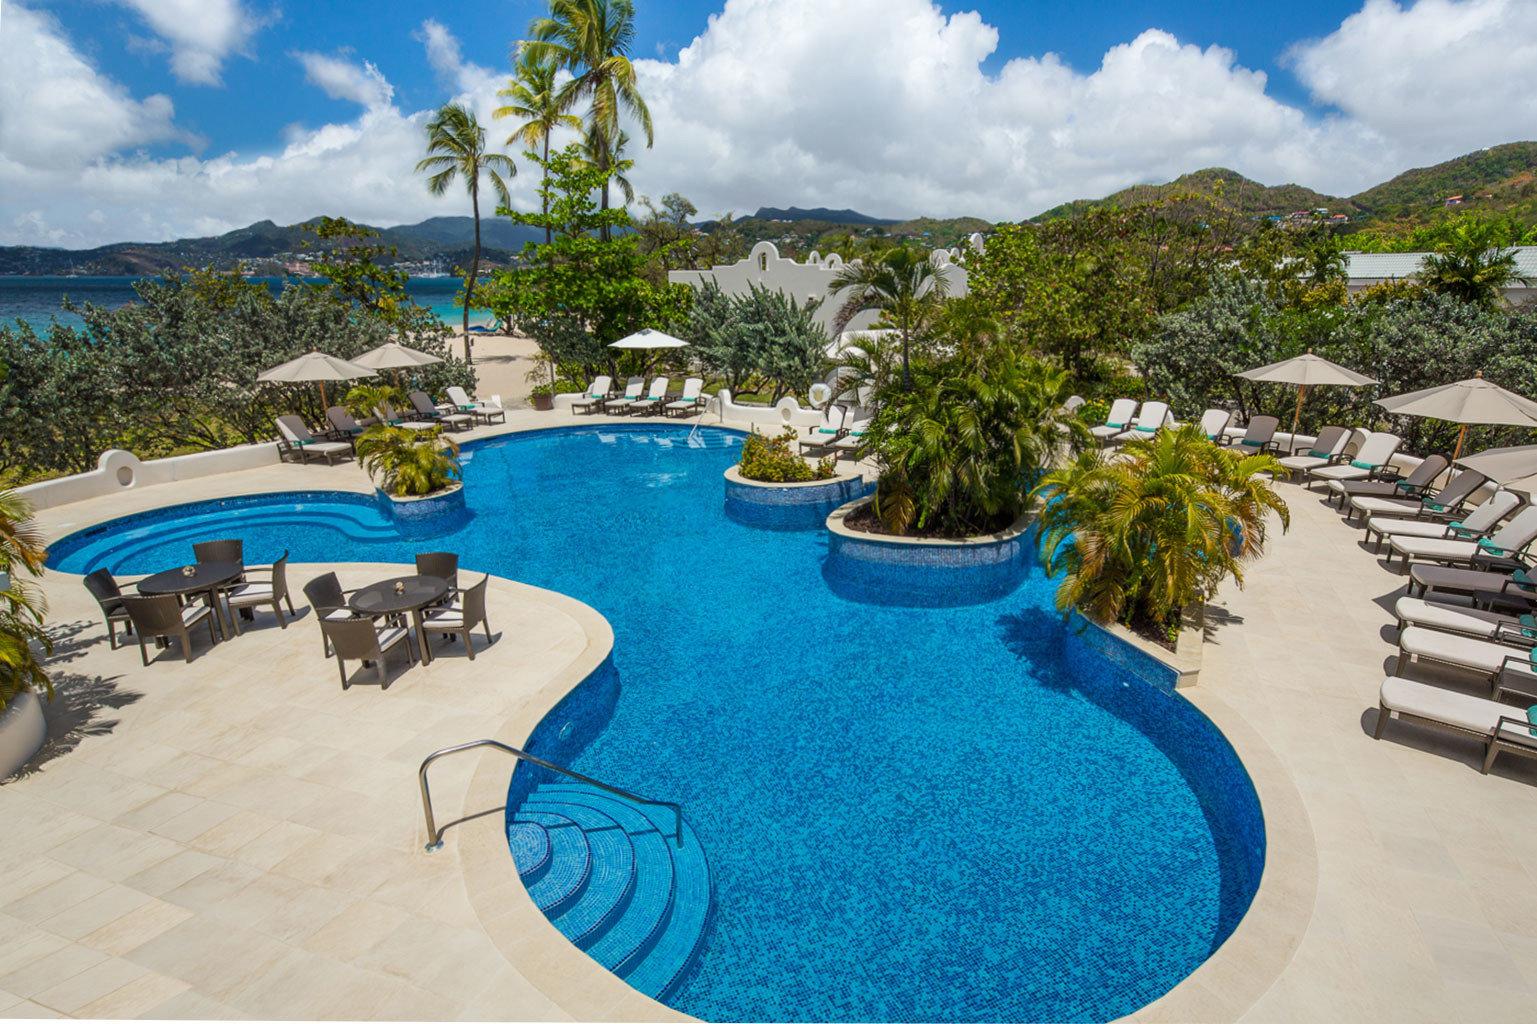 Lounge Luxury Modern Pool sky swimming pool property leisure Resort Water park Villa condominium resort town Nature backyard mansion sandy